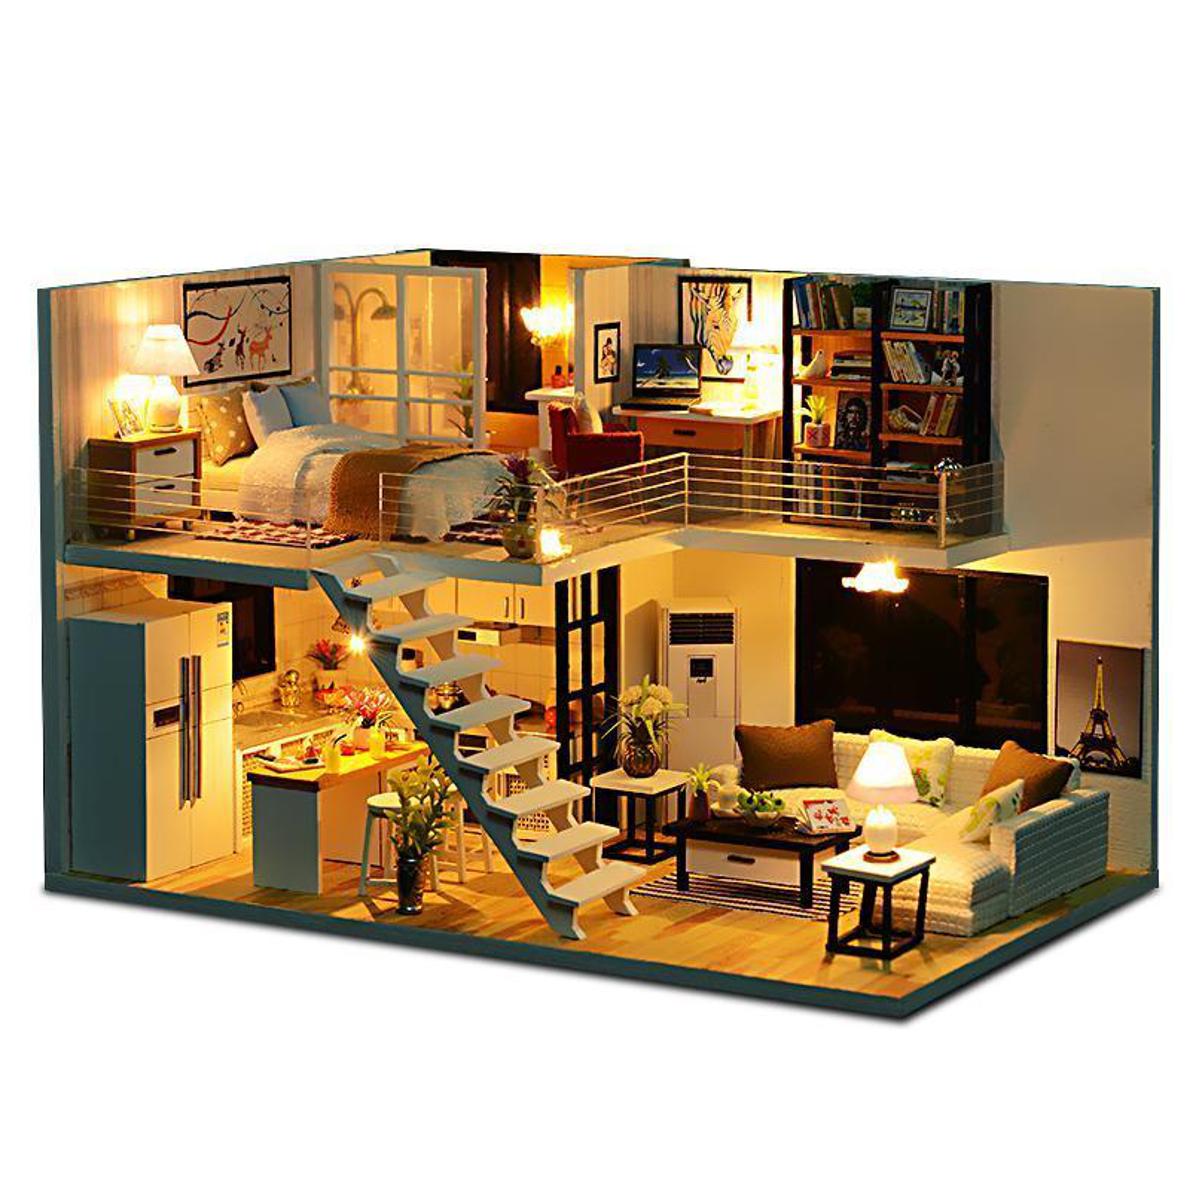 loft apartments miniature dollhouse wooden doll house furniture led rh banggood com